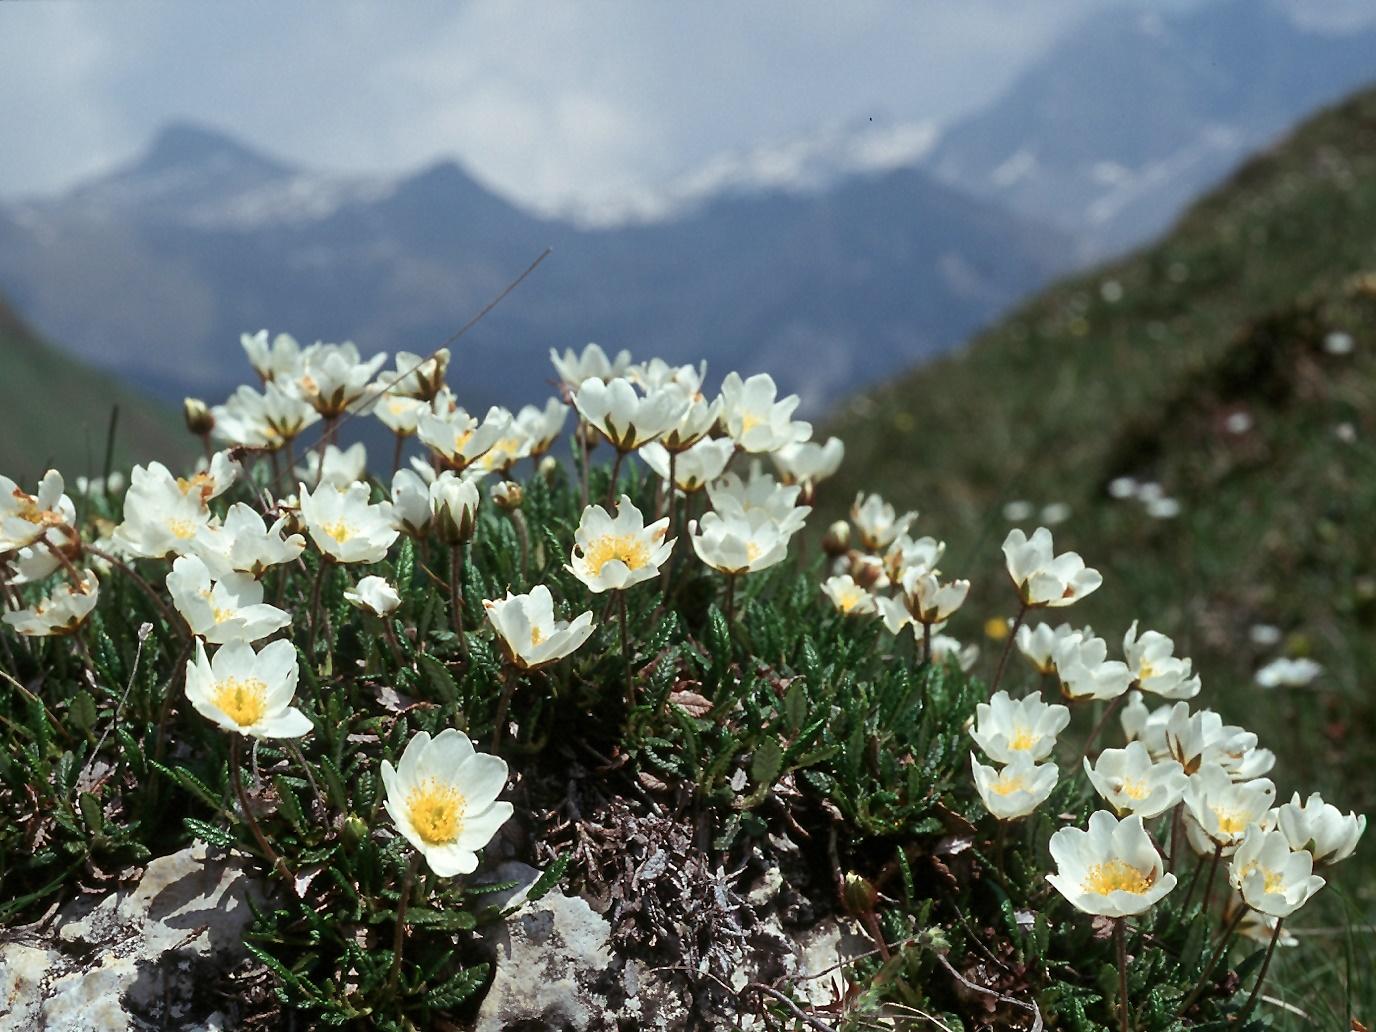 Image - Dryas octopetala (Mountain Avens)   BioLib.cz